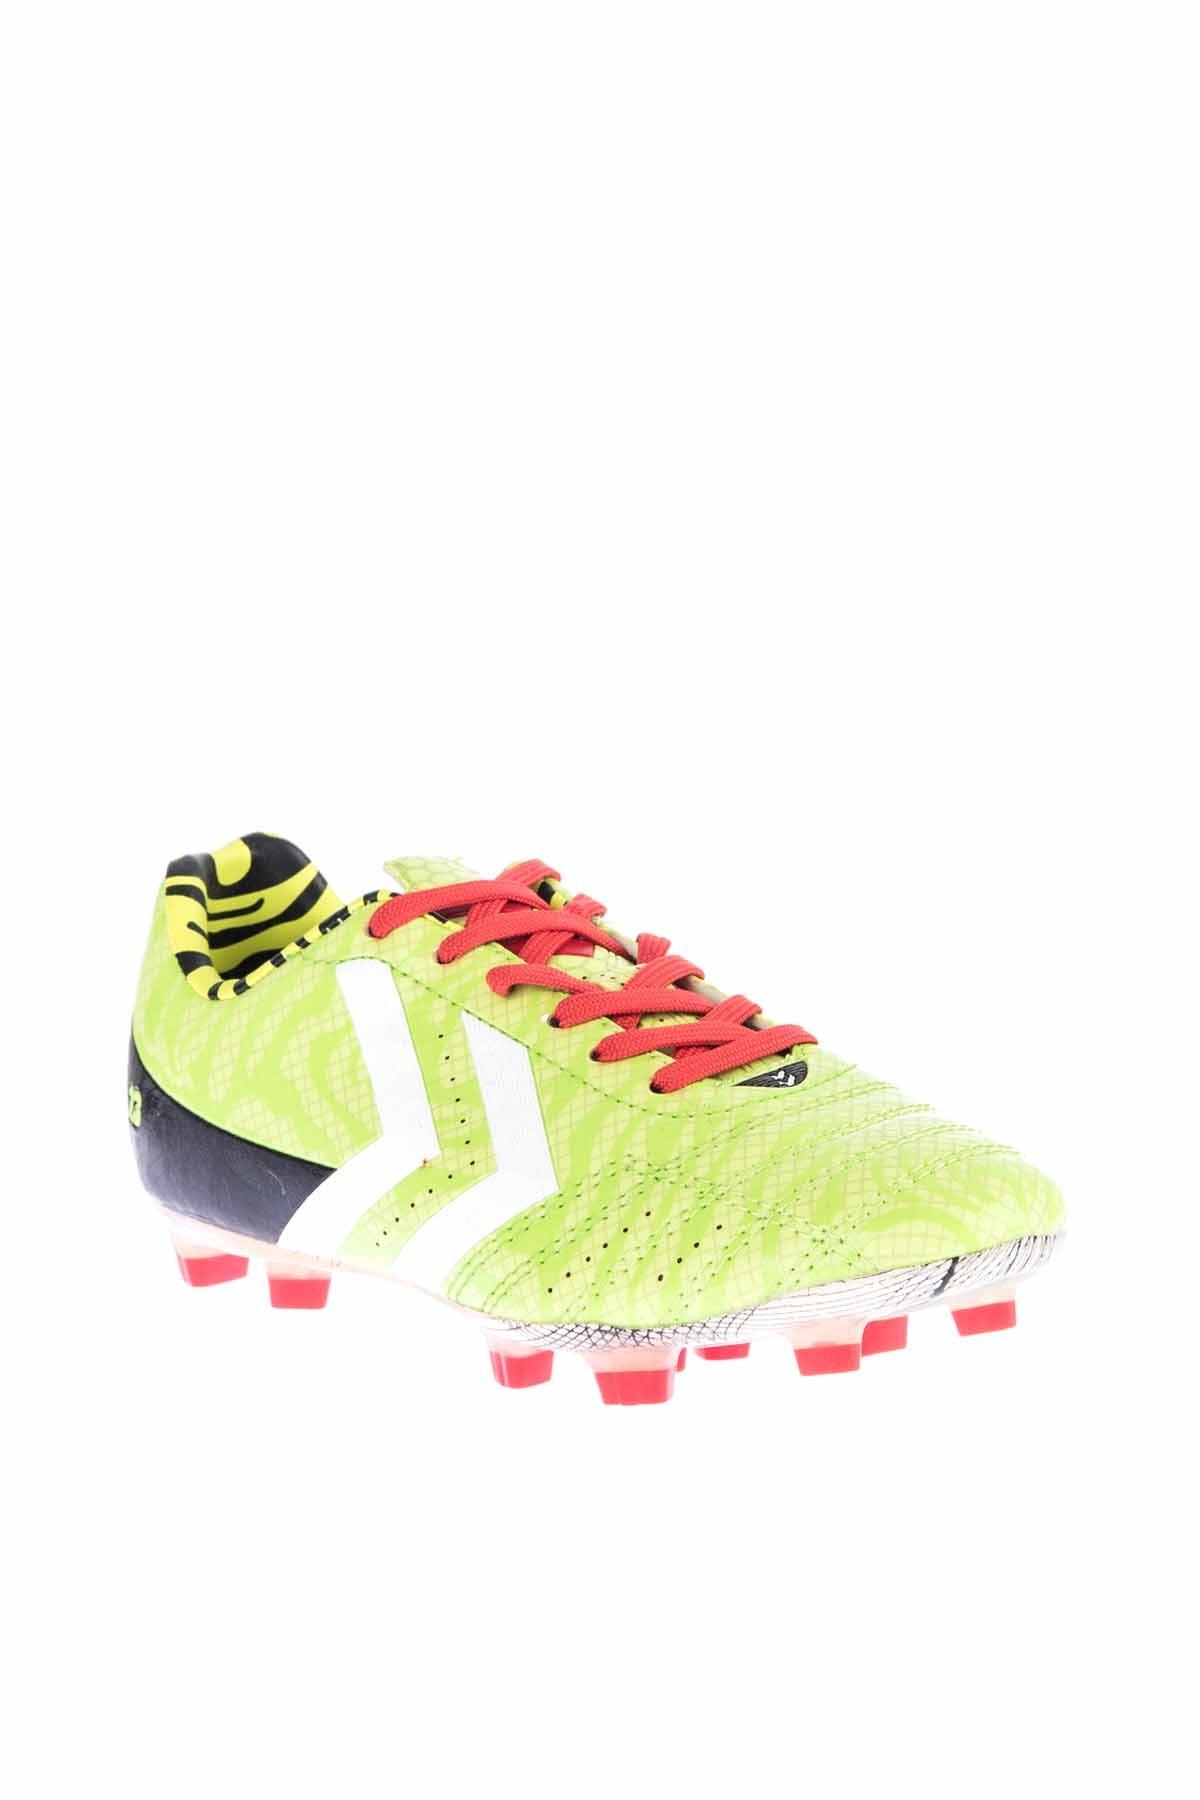 HUMMEL Yeşil Unisex Çocuk Ayakkabı Hummel Football Fg Junıor Lace Ss15 61077-6595